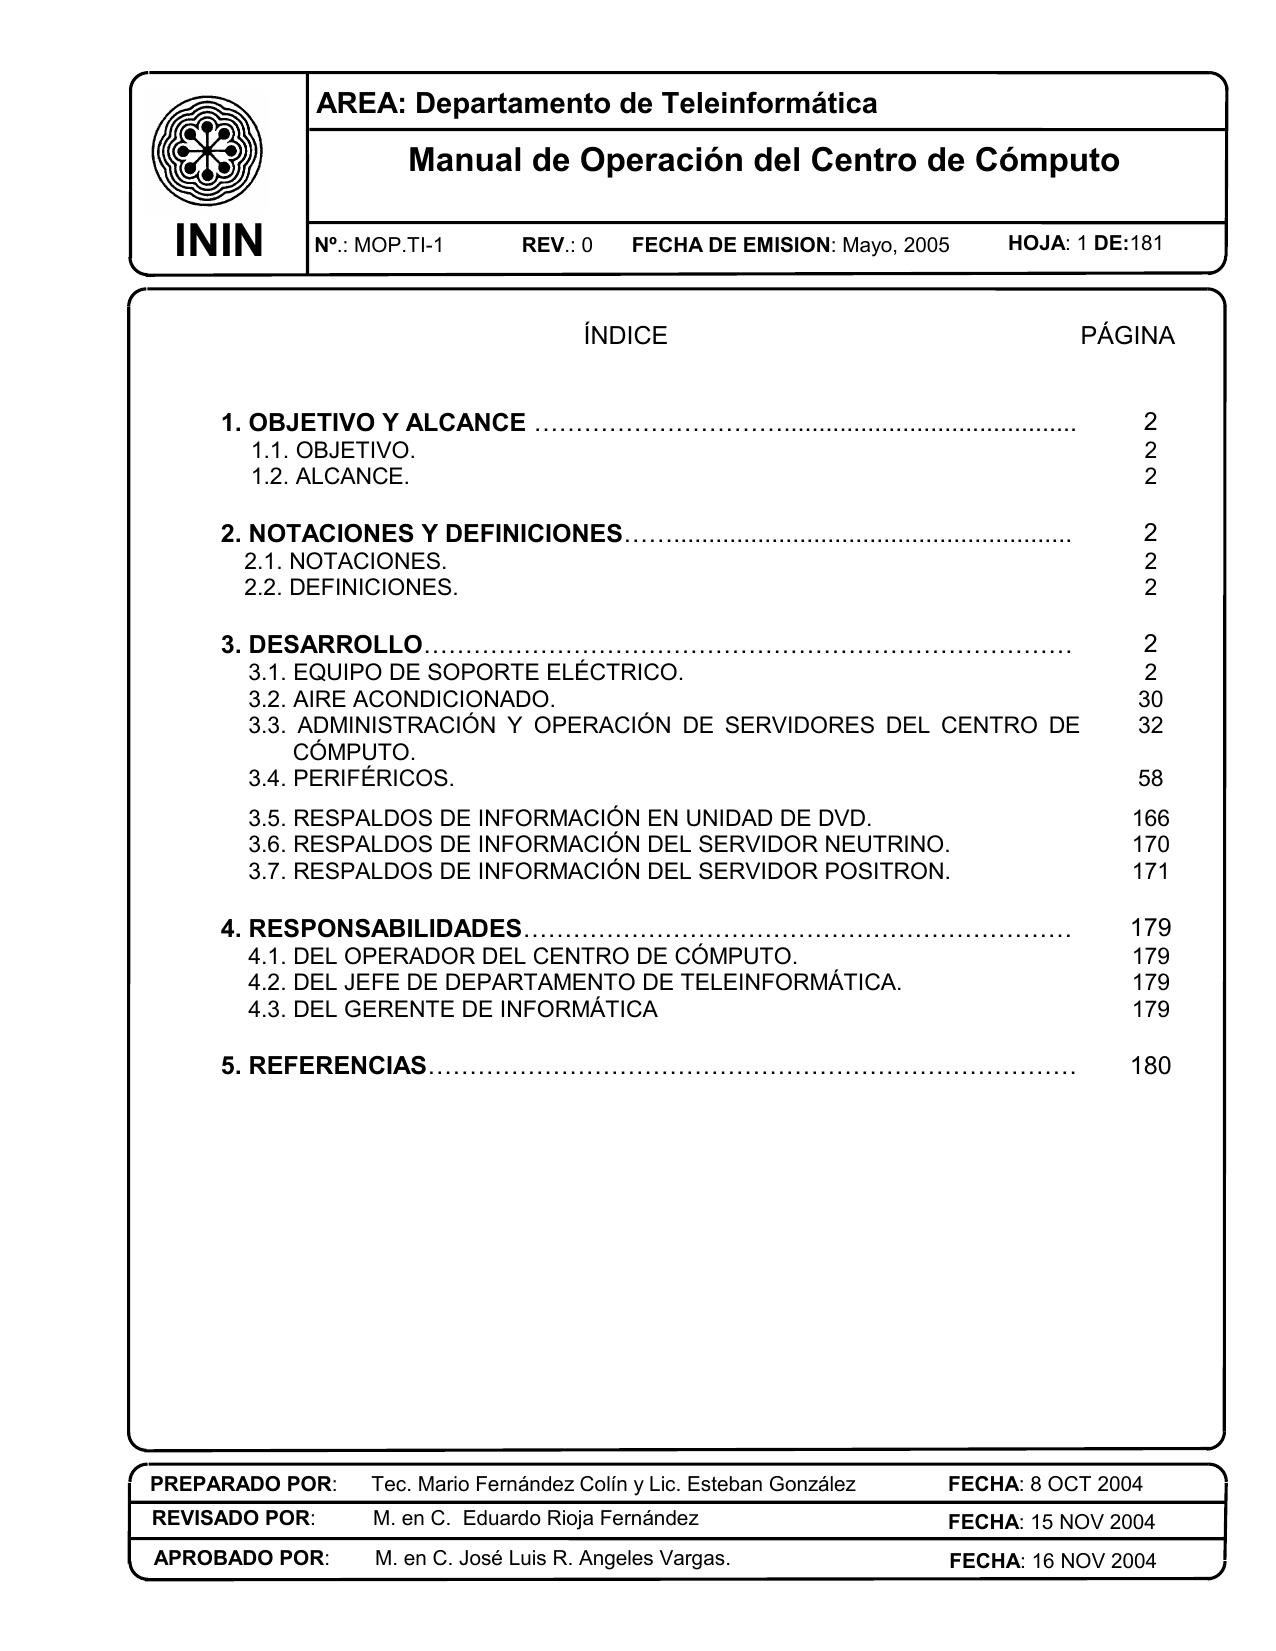 Manual de Operación del Centro de Cómputo | manualzz.com